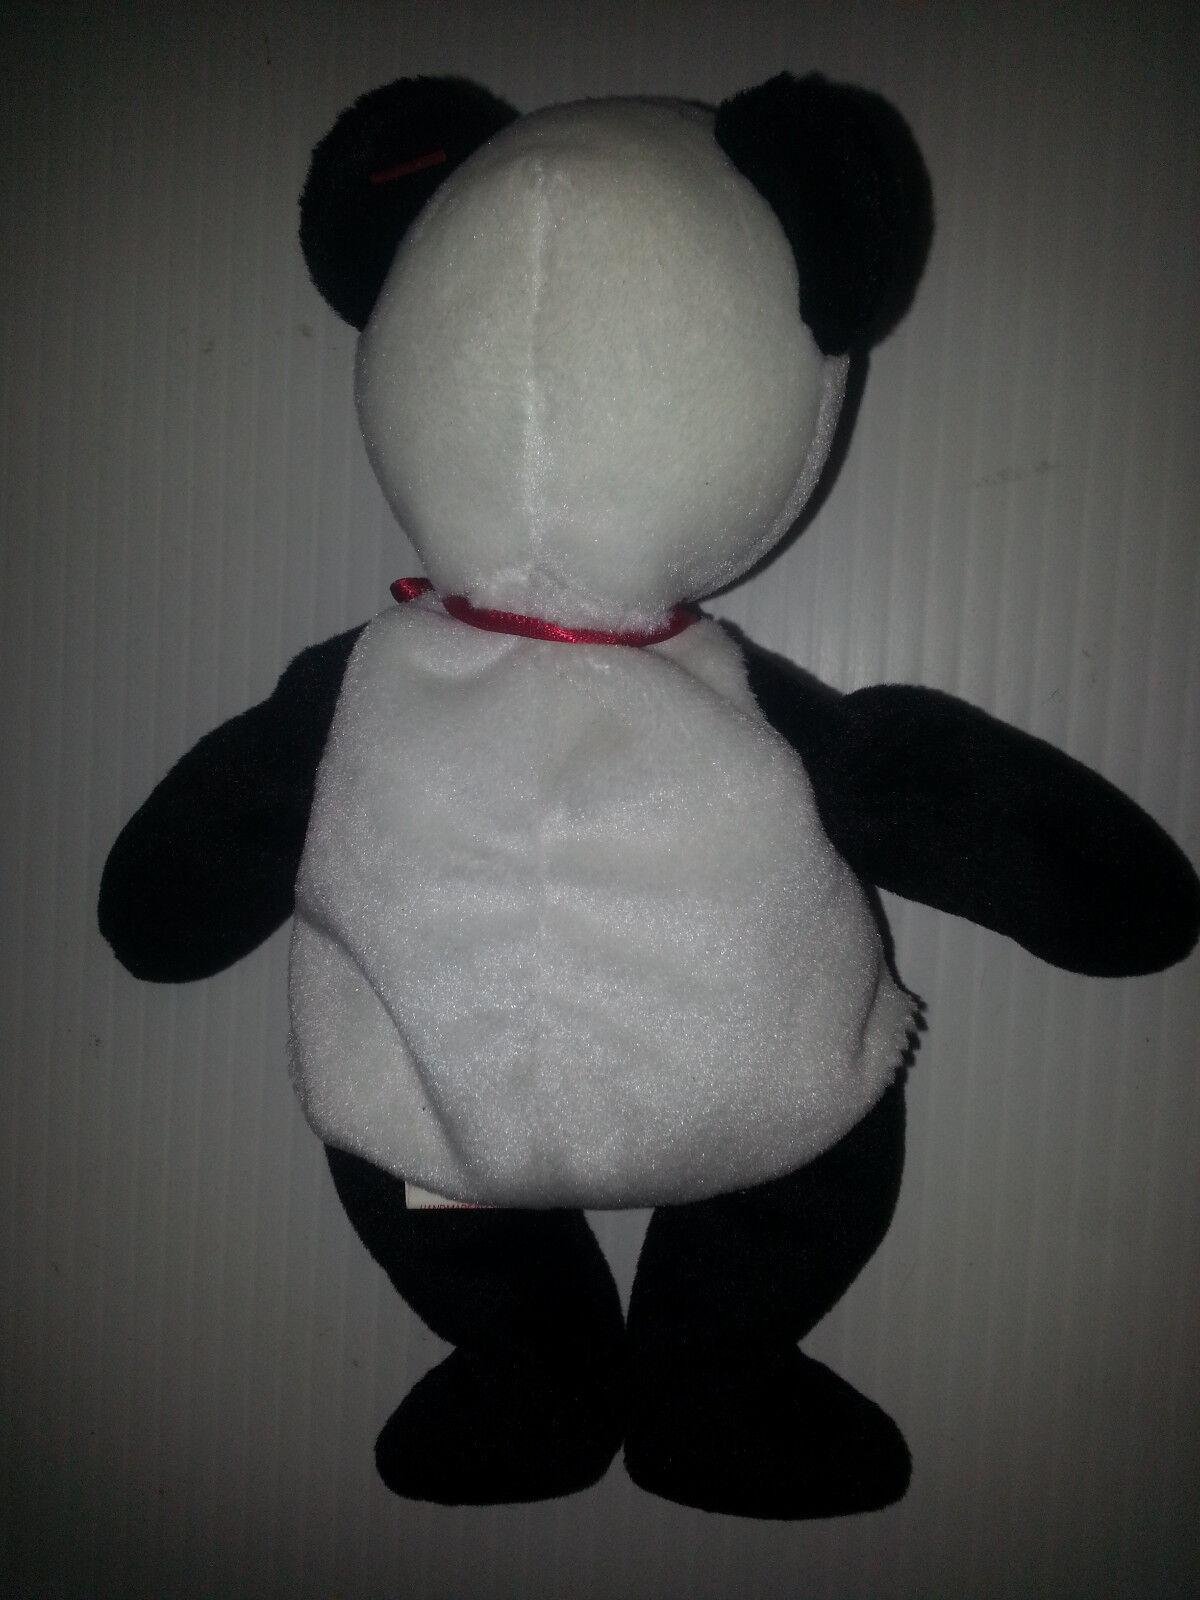 ... New Rare TY Beanie Baby Baby Beanie FORTUNE Panda Bear Retired 1997  Tush Errors Mistakes 50cb5b ... 92e3e8a1d9ca